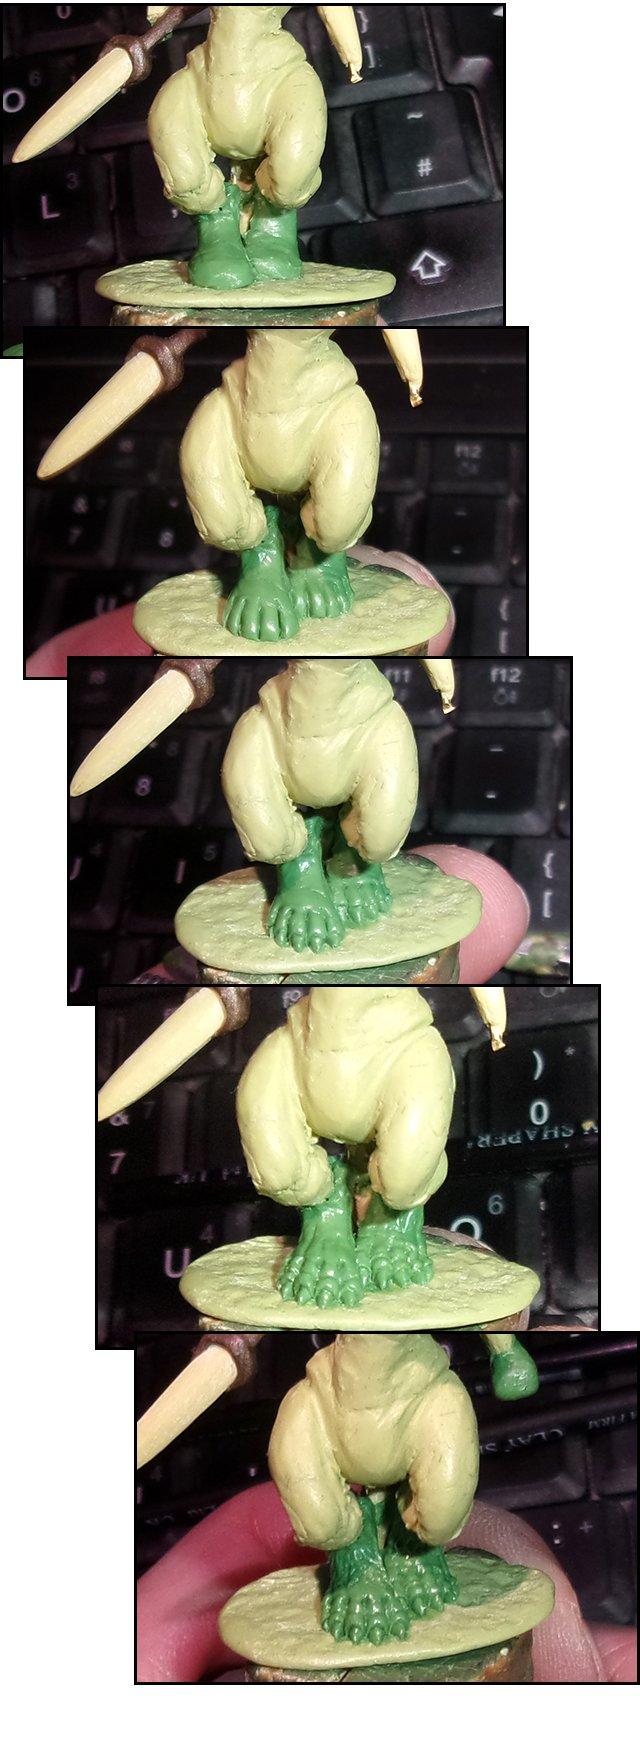 badger-sculpting-12.jpg